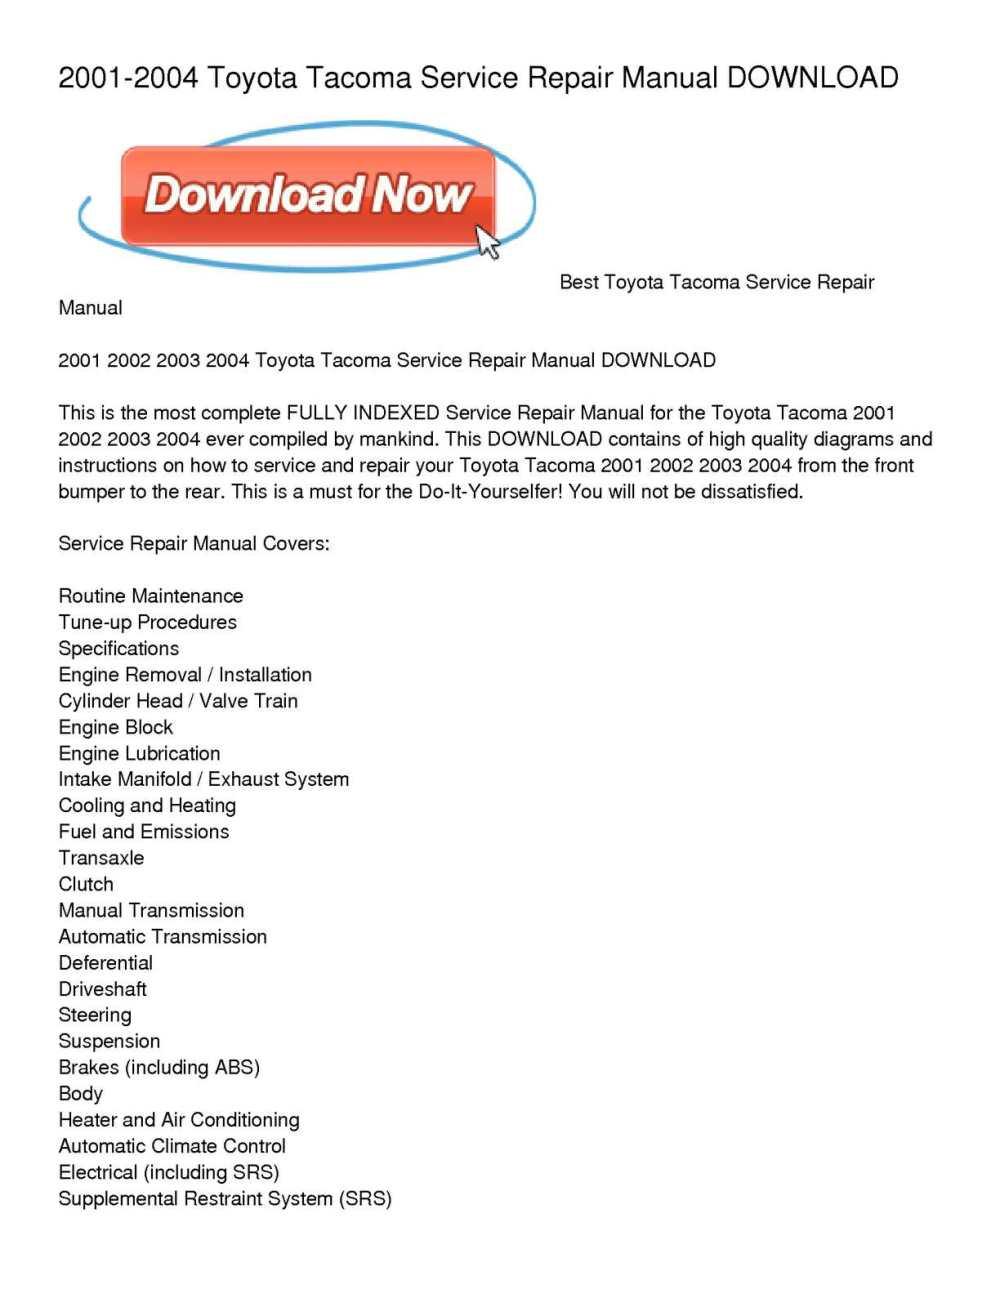 medium resolution of calam o 2001 2004 toyota tacoma service repair manual download 2004 toyota tacoma engine diagram